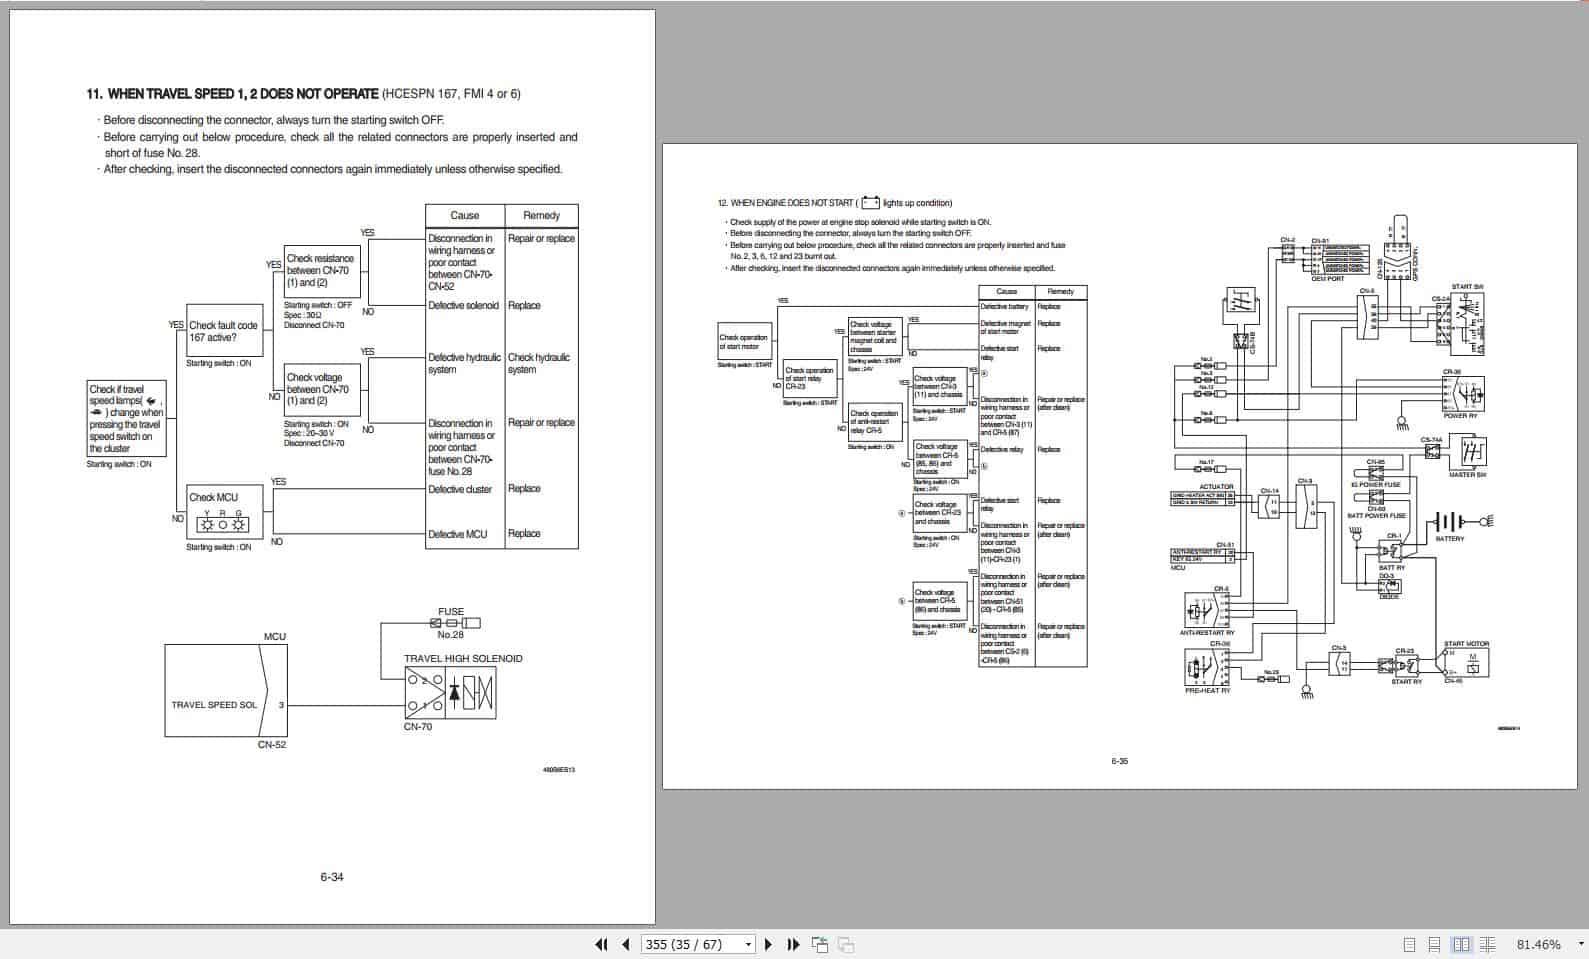 Hyundai_CERES_Heavy_Equipment_Service_Manual_062020_Offline_DVD10